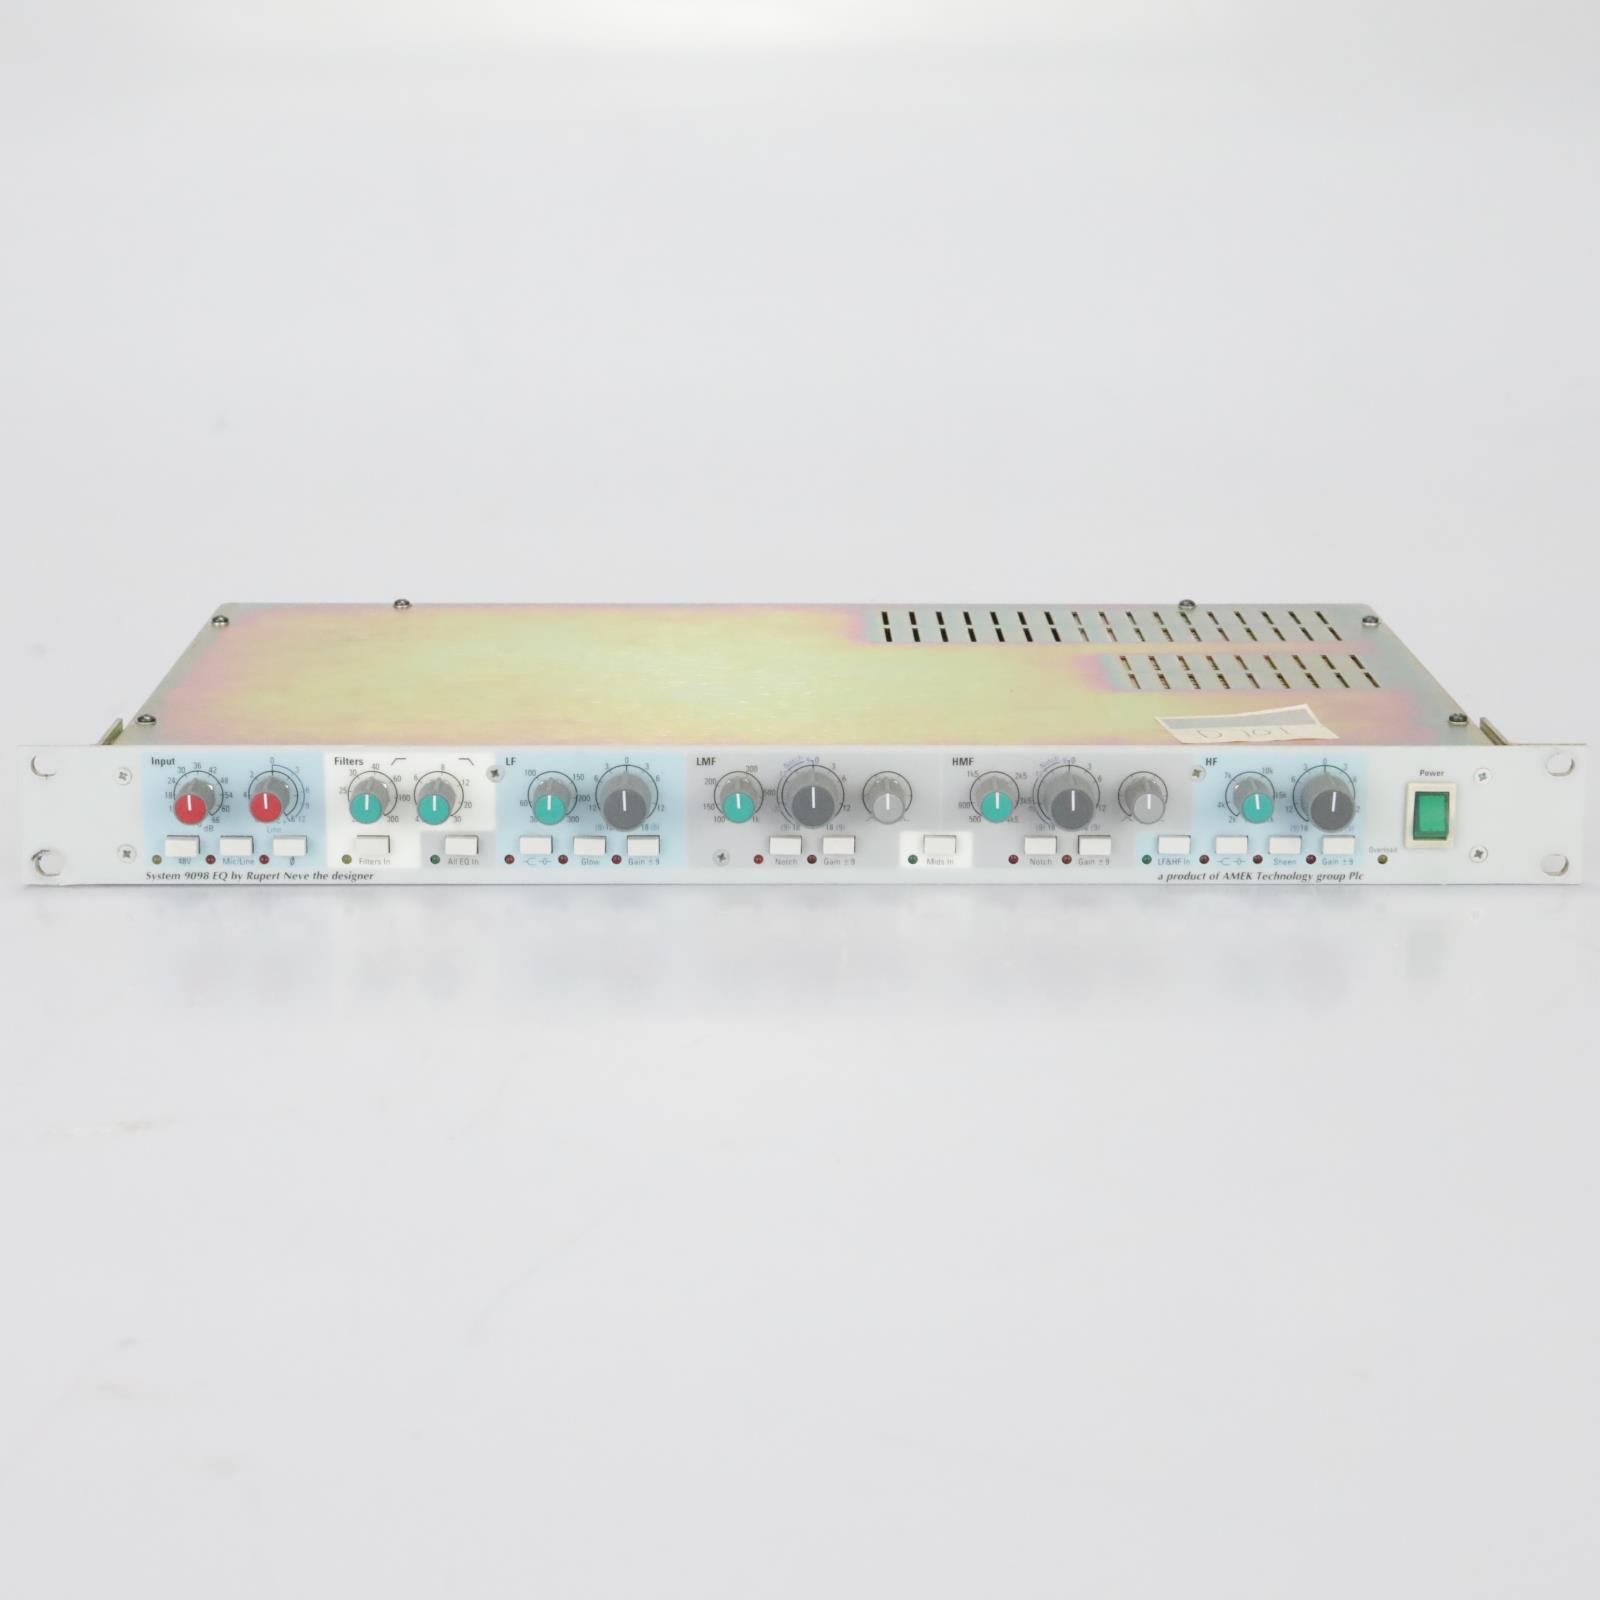 Amek System 9098 EQ / Mic Preamp By Rupert Neve #39392